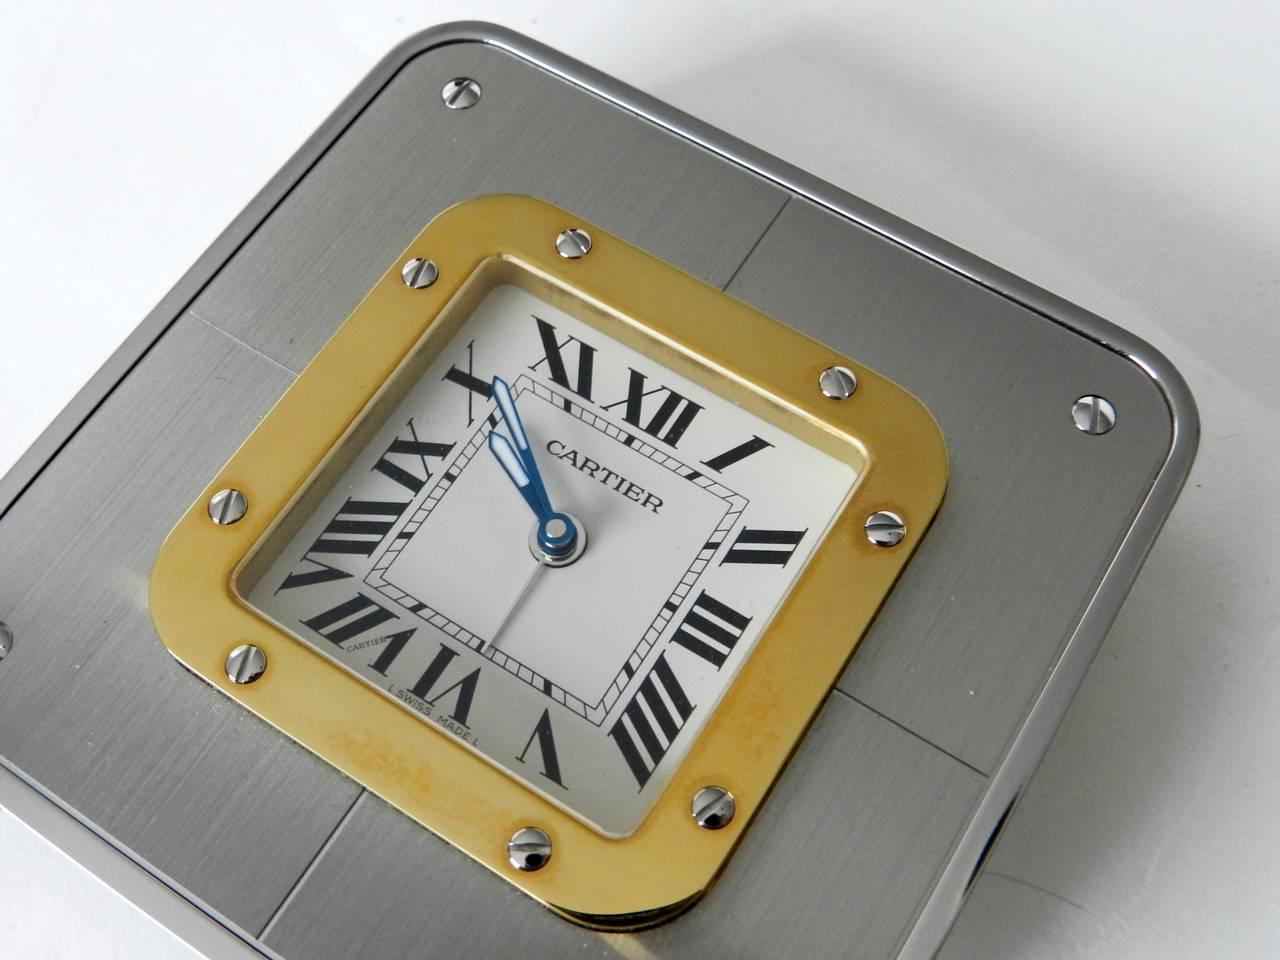 Cartier santos desk alarm clock in box at 1stdibs cartier santos desk alarm clock in box 3 amipublicfo Images